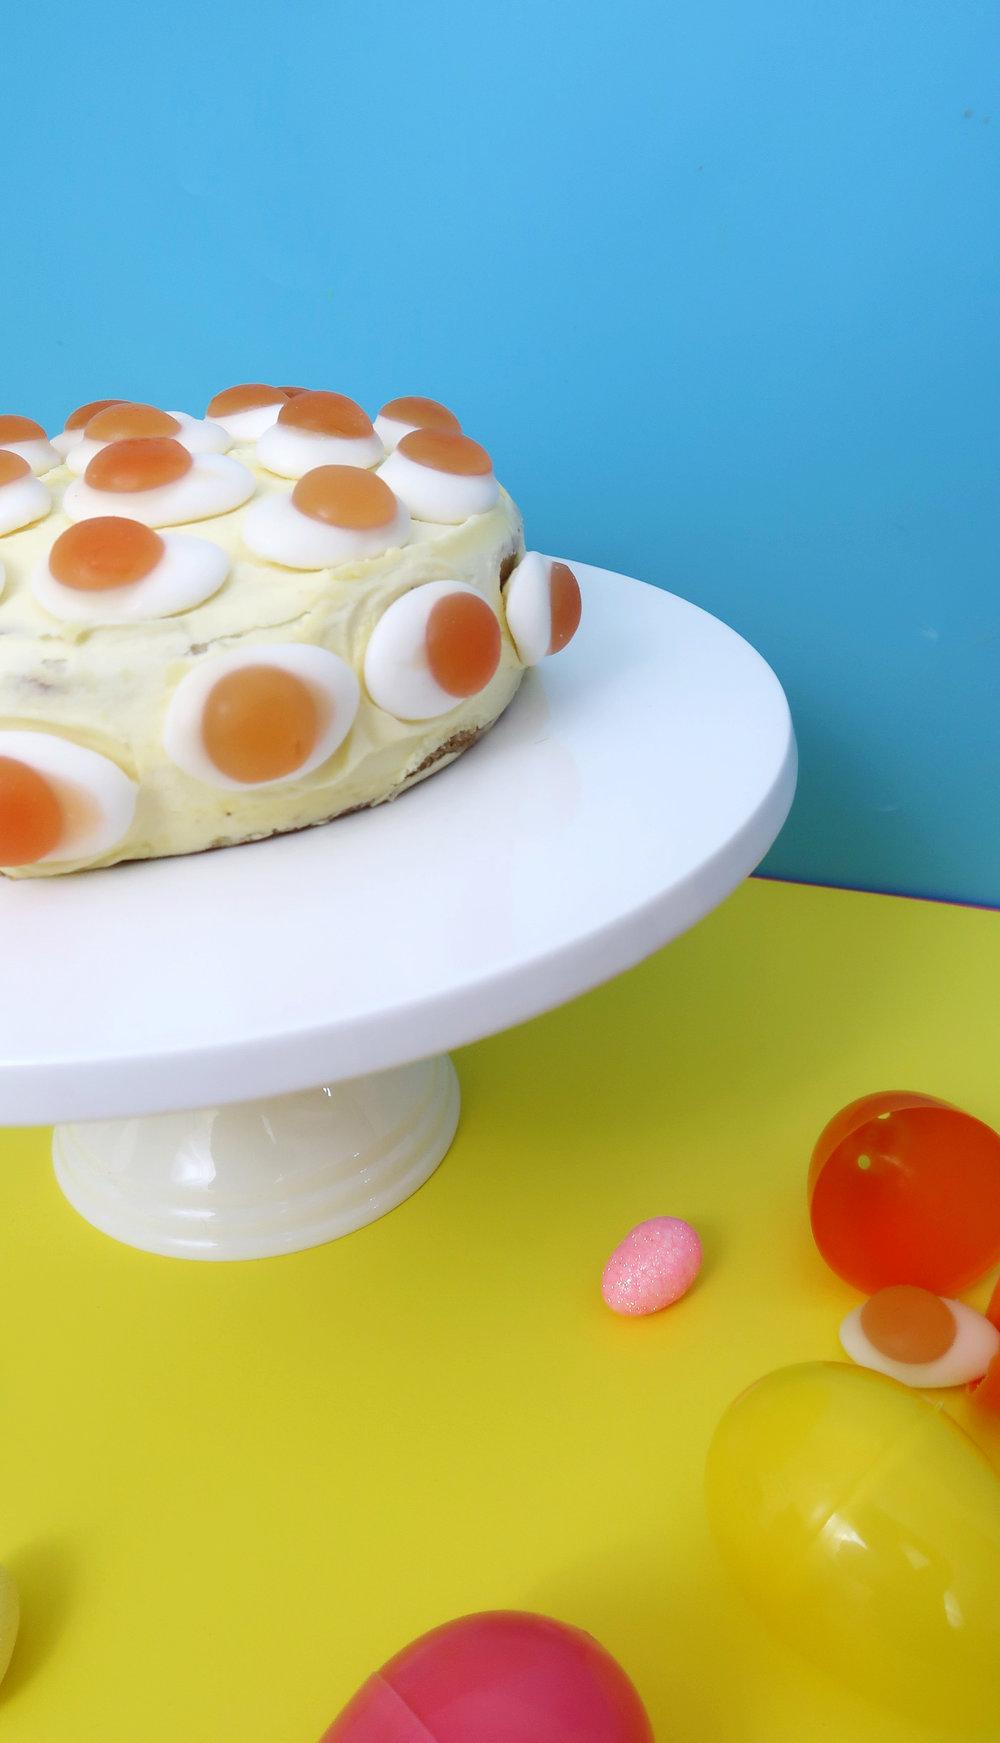 how to make a fried egg easter cake